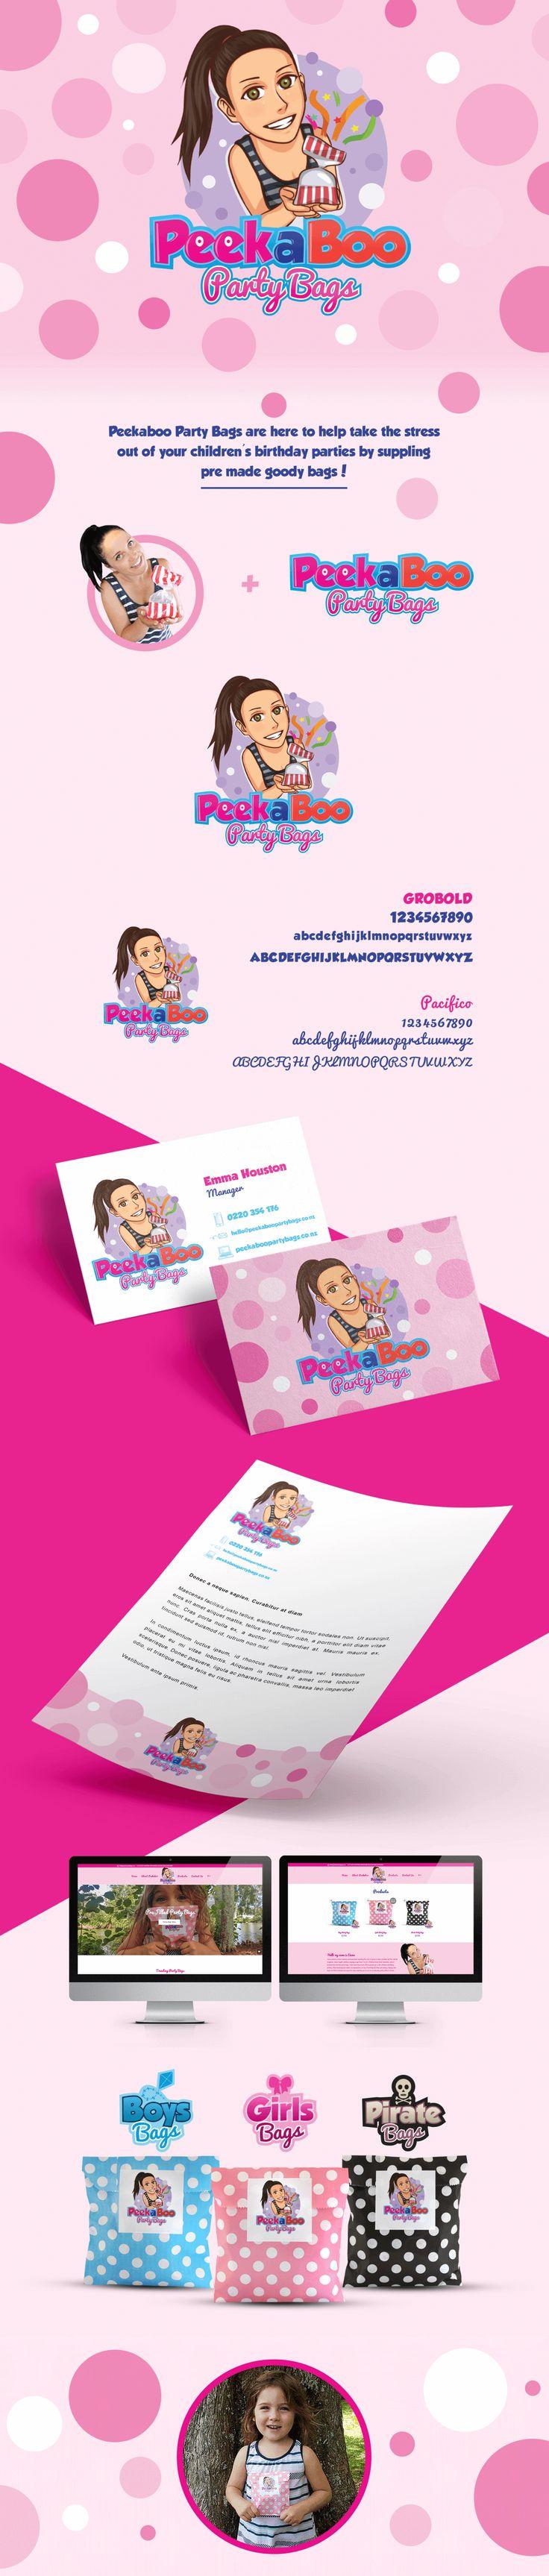 Peekaboo Party Bags - Brand Identity #Branding #GraphicDesign